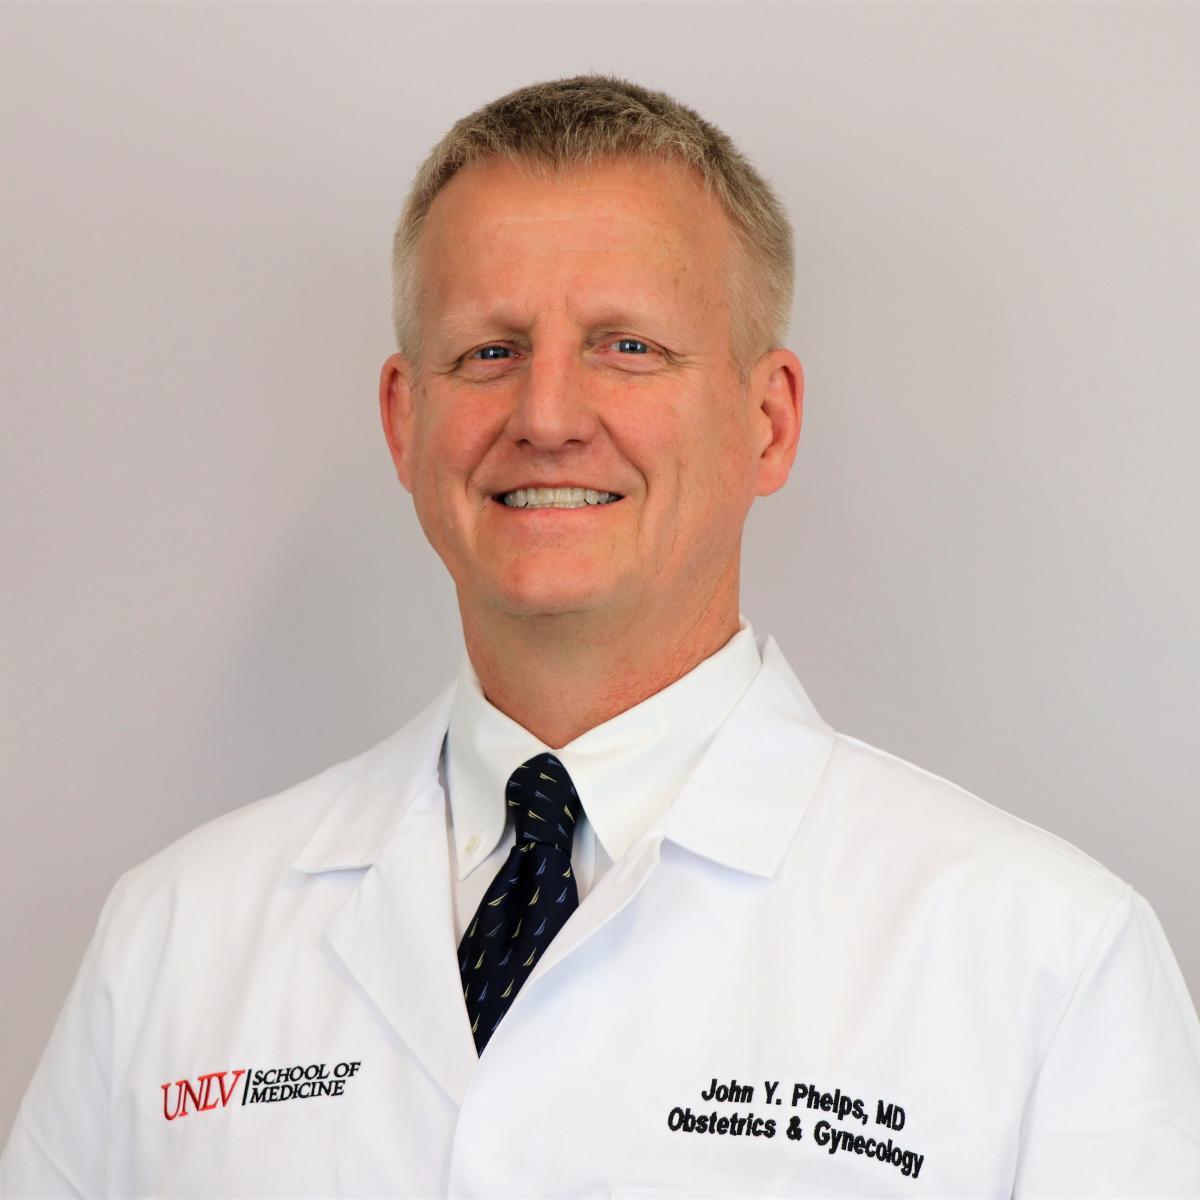 John Phelps, MD, JD, LLM - UNLV Medicine